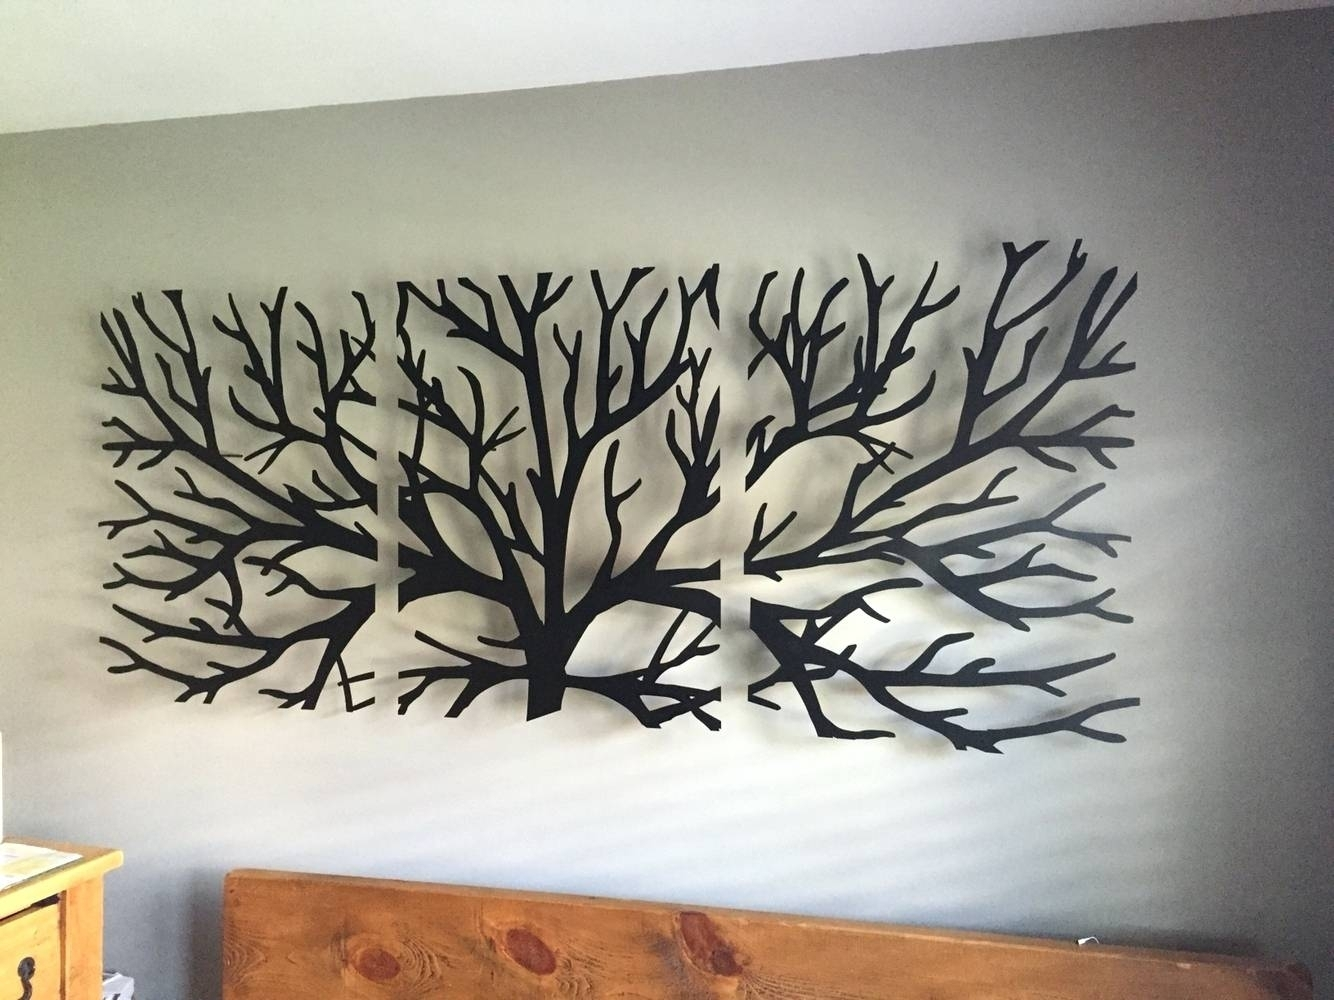 30 Extra Large Metal Wall Art, 35 Large Outdoor Metal Wall Art My for Large Metal Wall Art (Image 1 of 20)